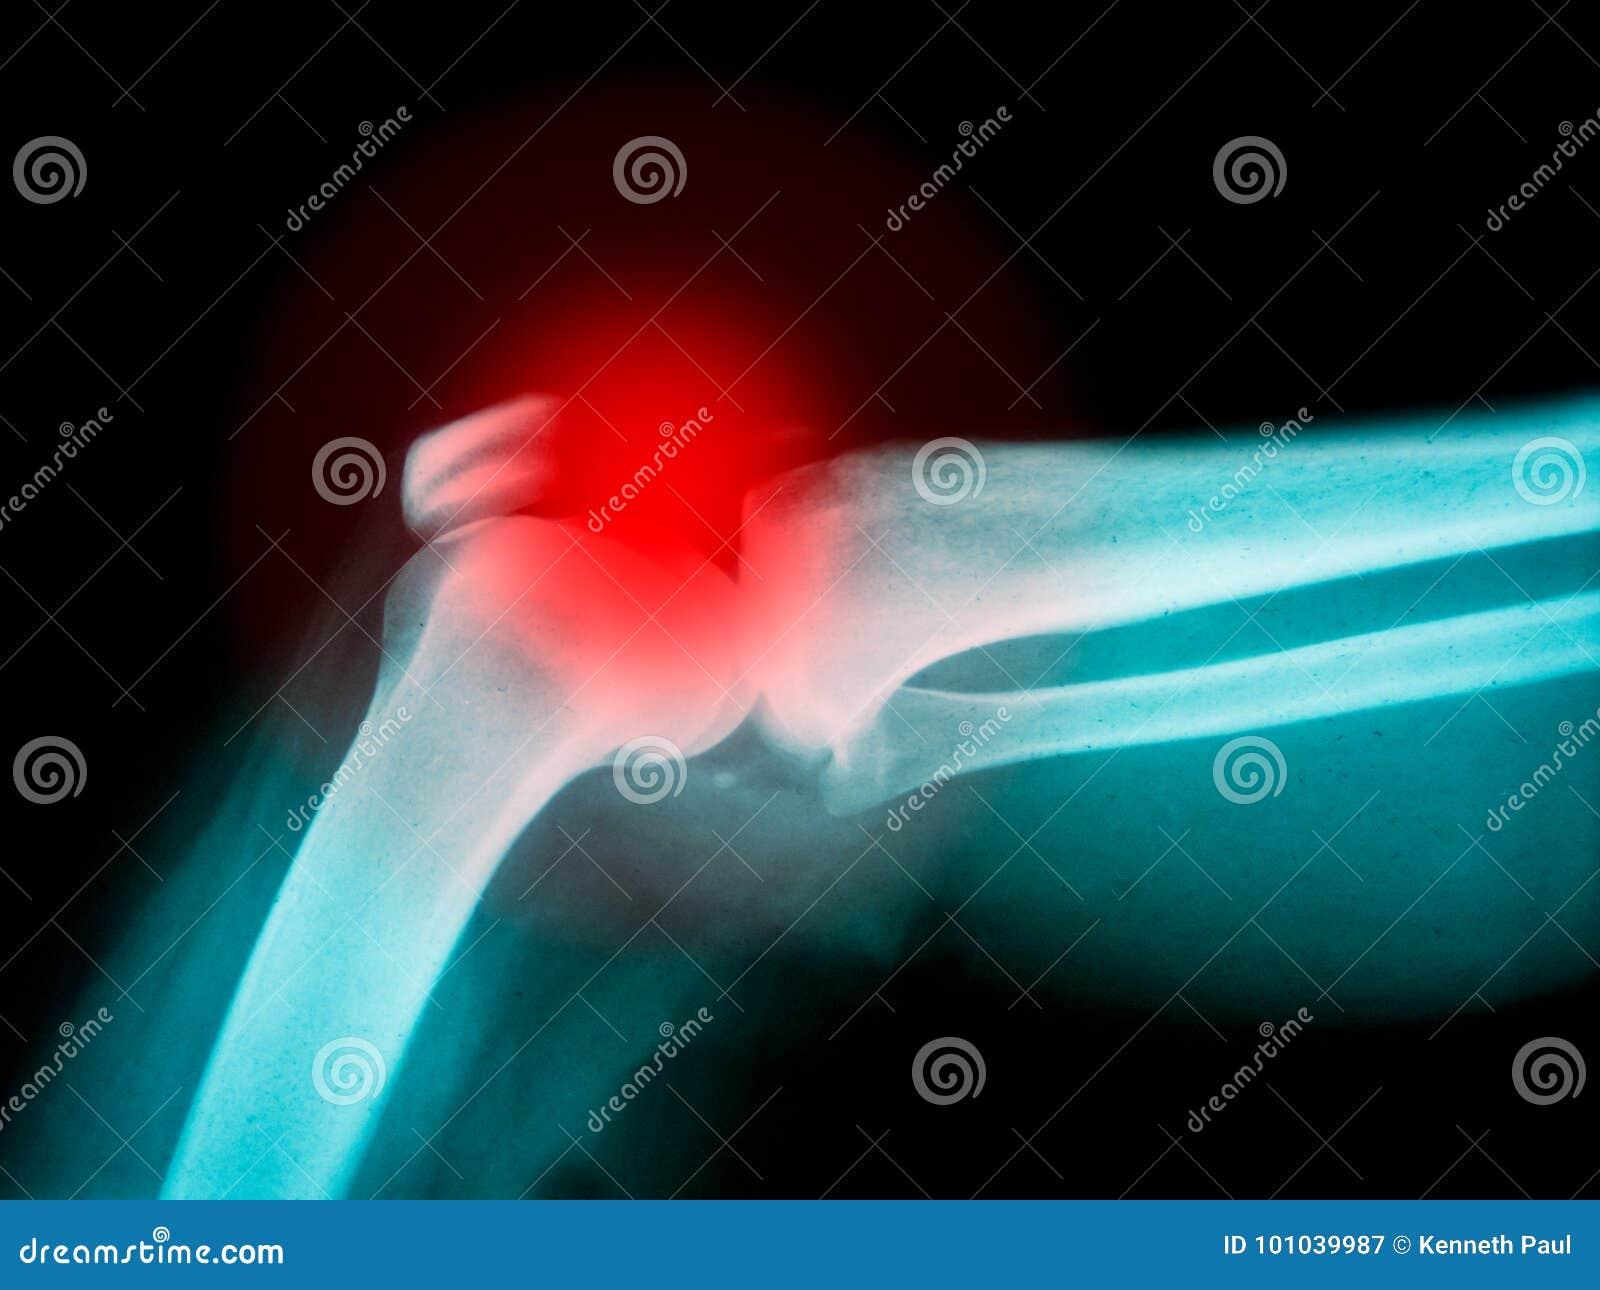 Arm X-ray with highlight on broken bone